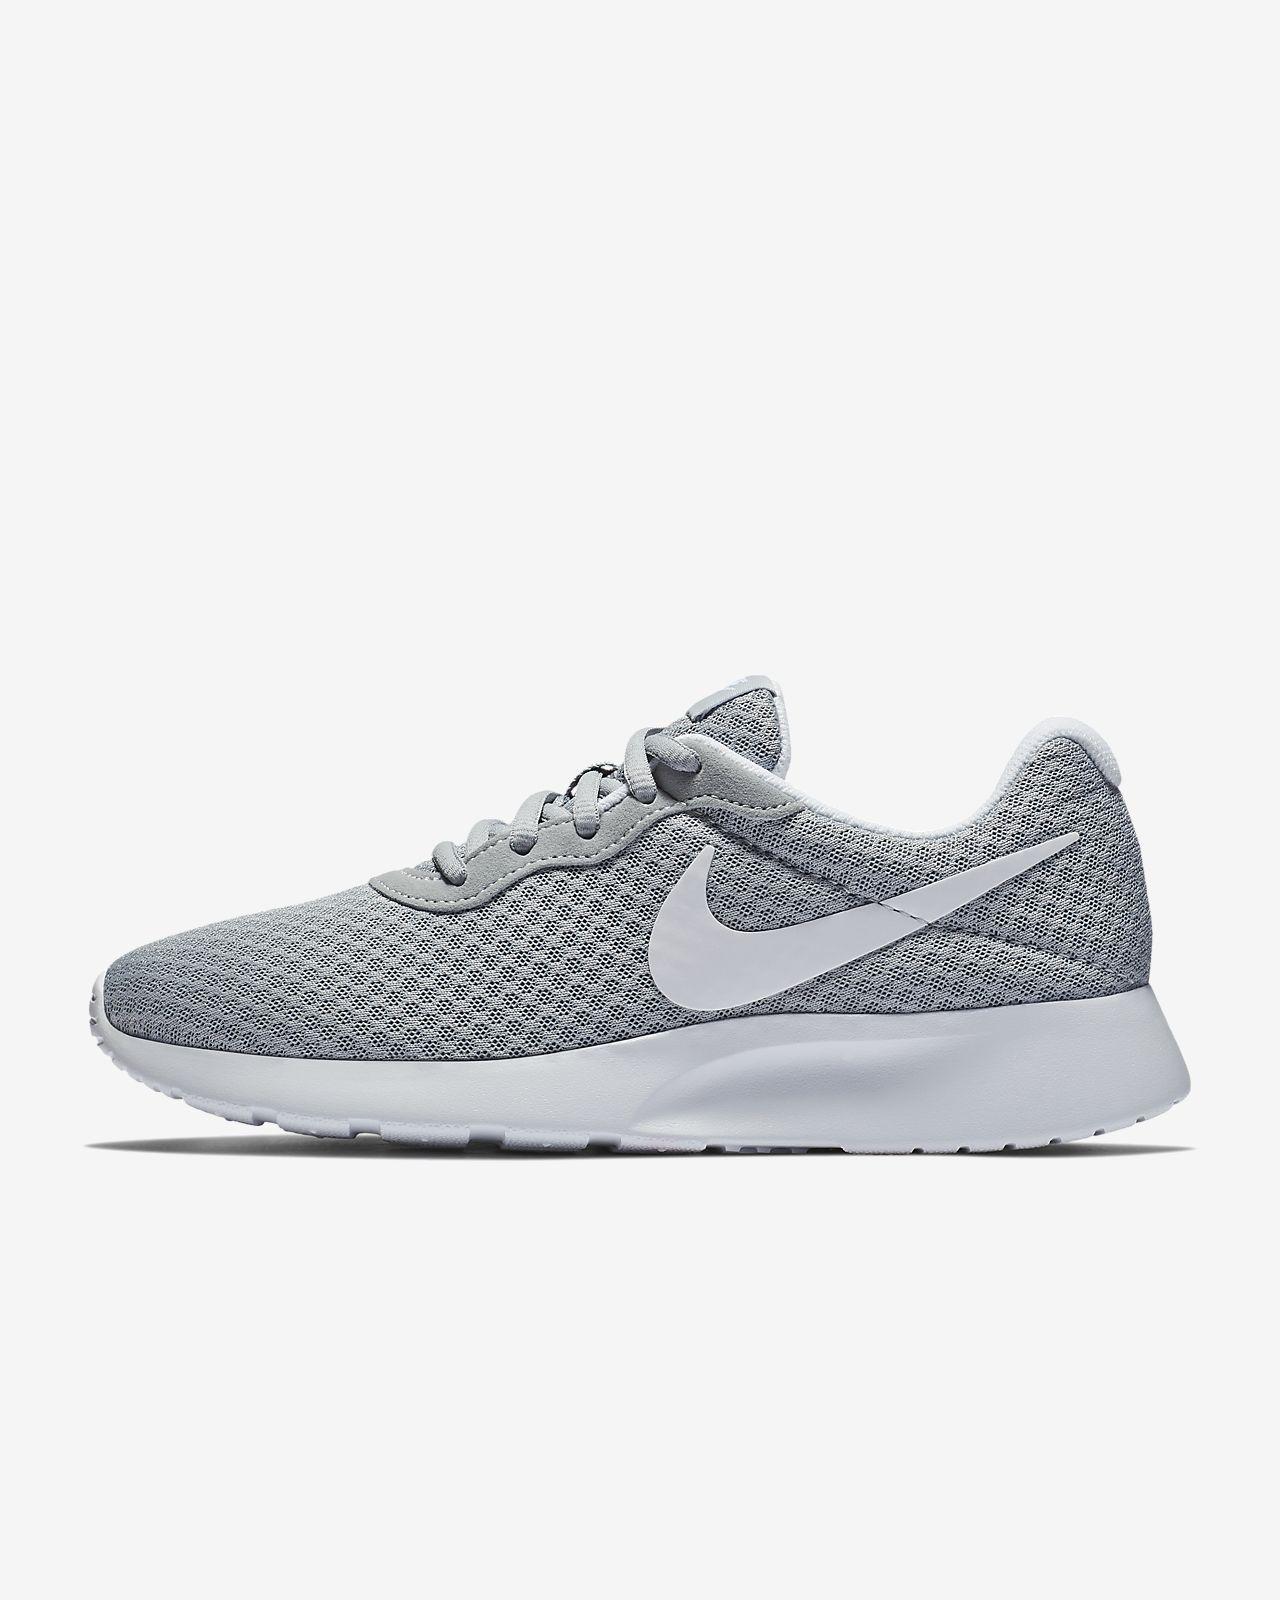 6860197cd2f Sko Nike Tanjun för kvinnor. Nike.com SE